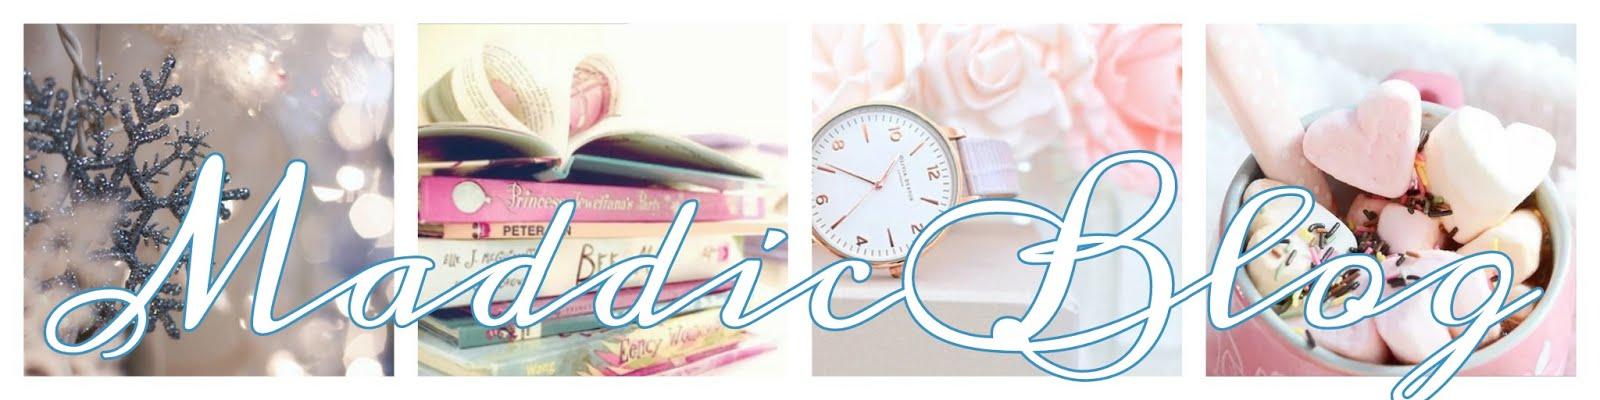 Maddic Blog